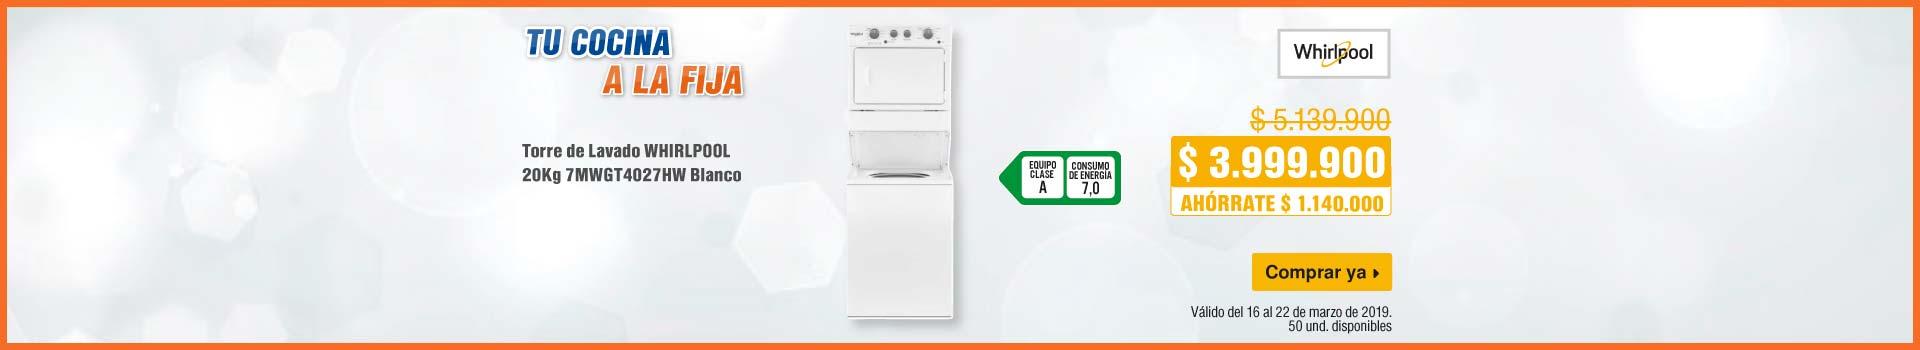 AK-KT-mayores-3-ELECT-BCAT-refrigeracion-WHIRLPOOL-160319-3